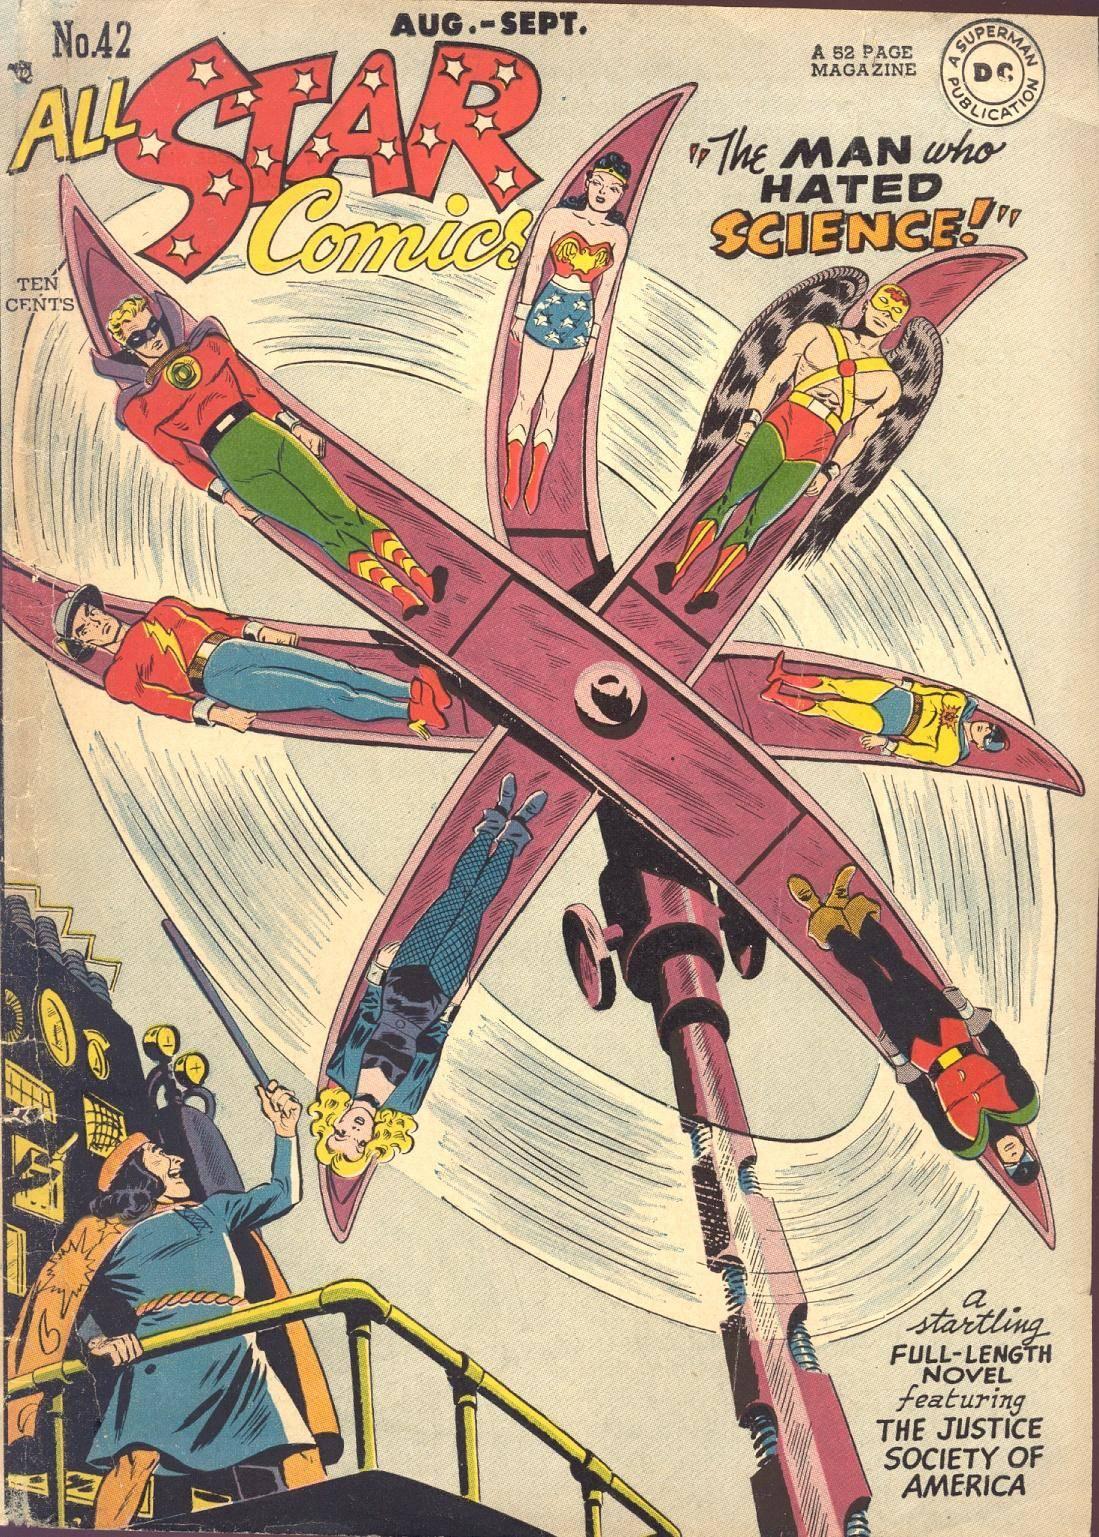 All-Star Comics 042 1948